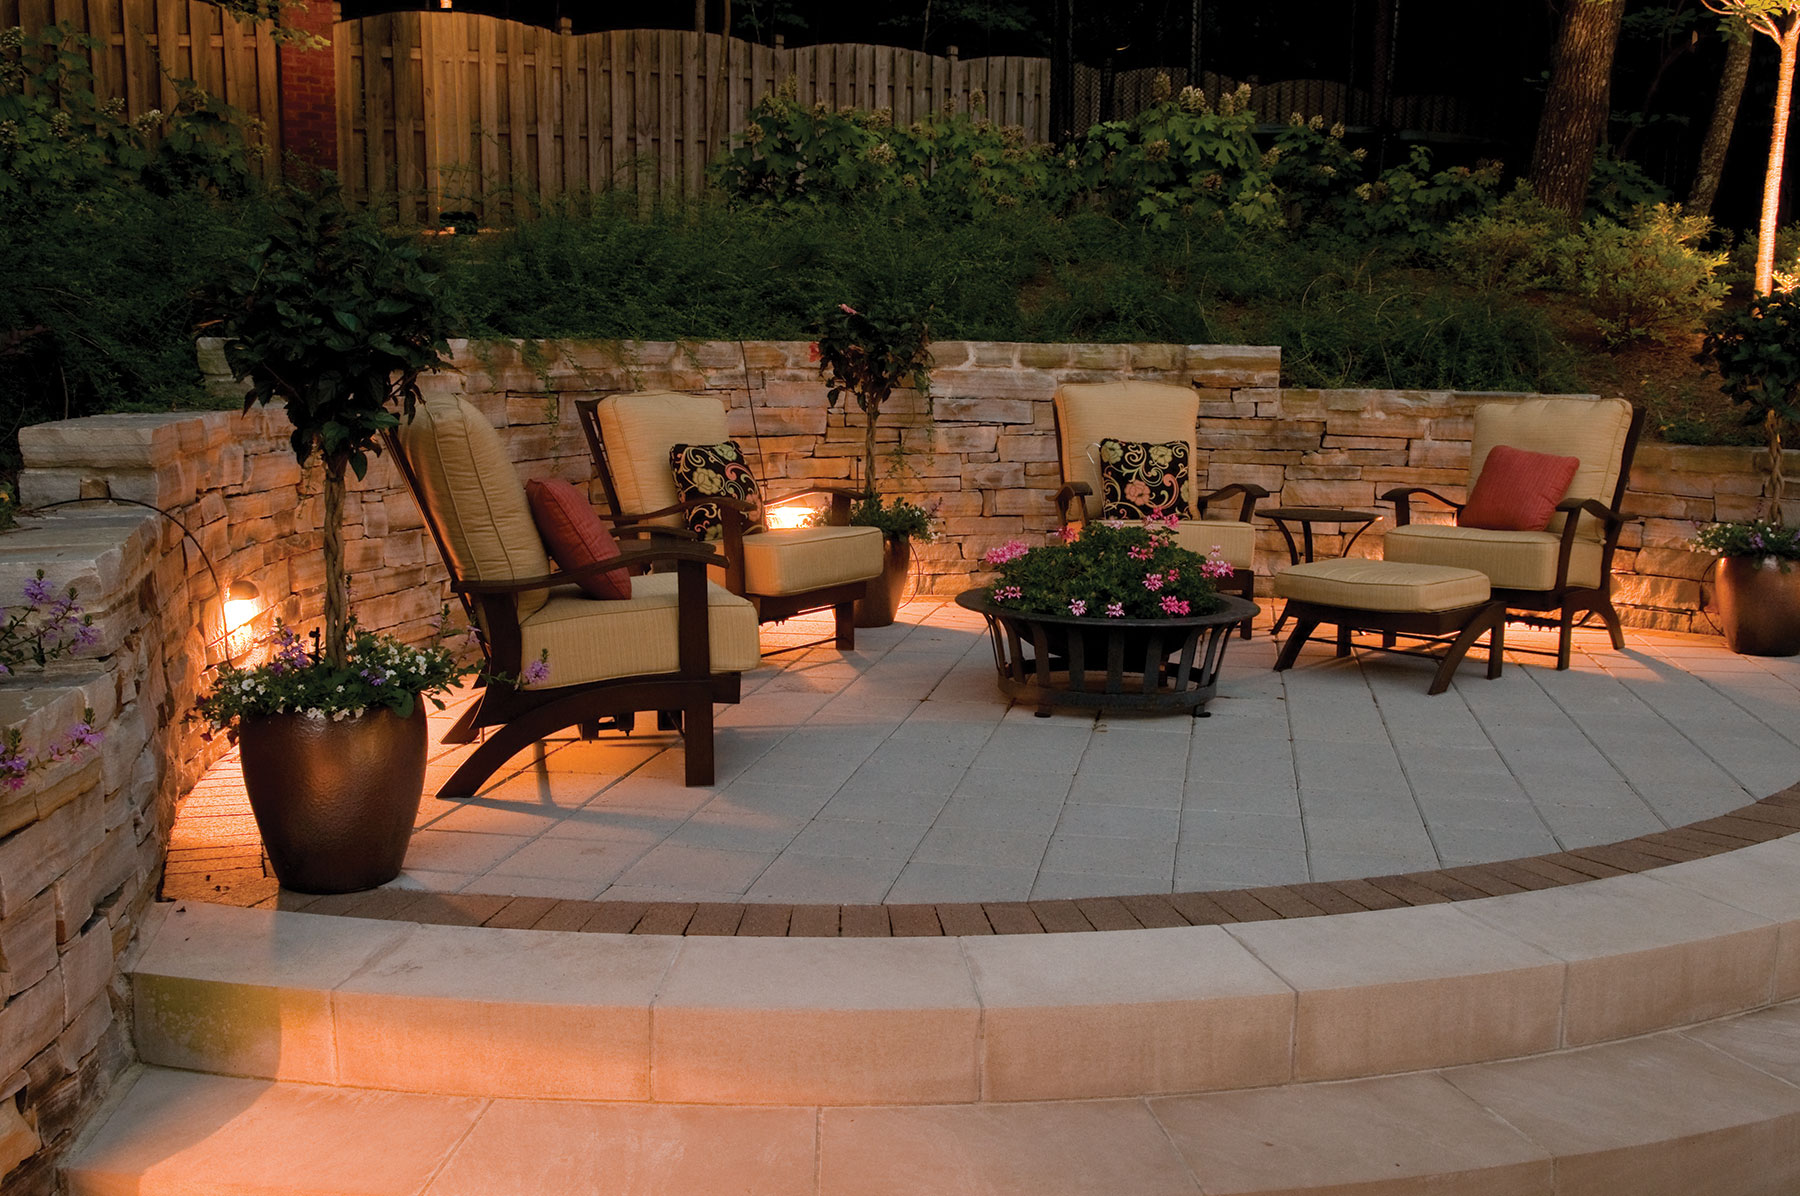 Uncategorized Outdoor Lighting And Landscape Lighting In